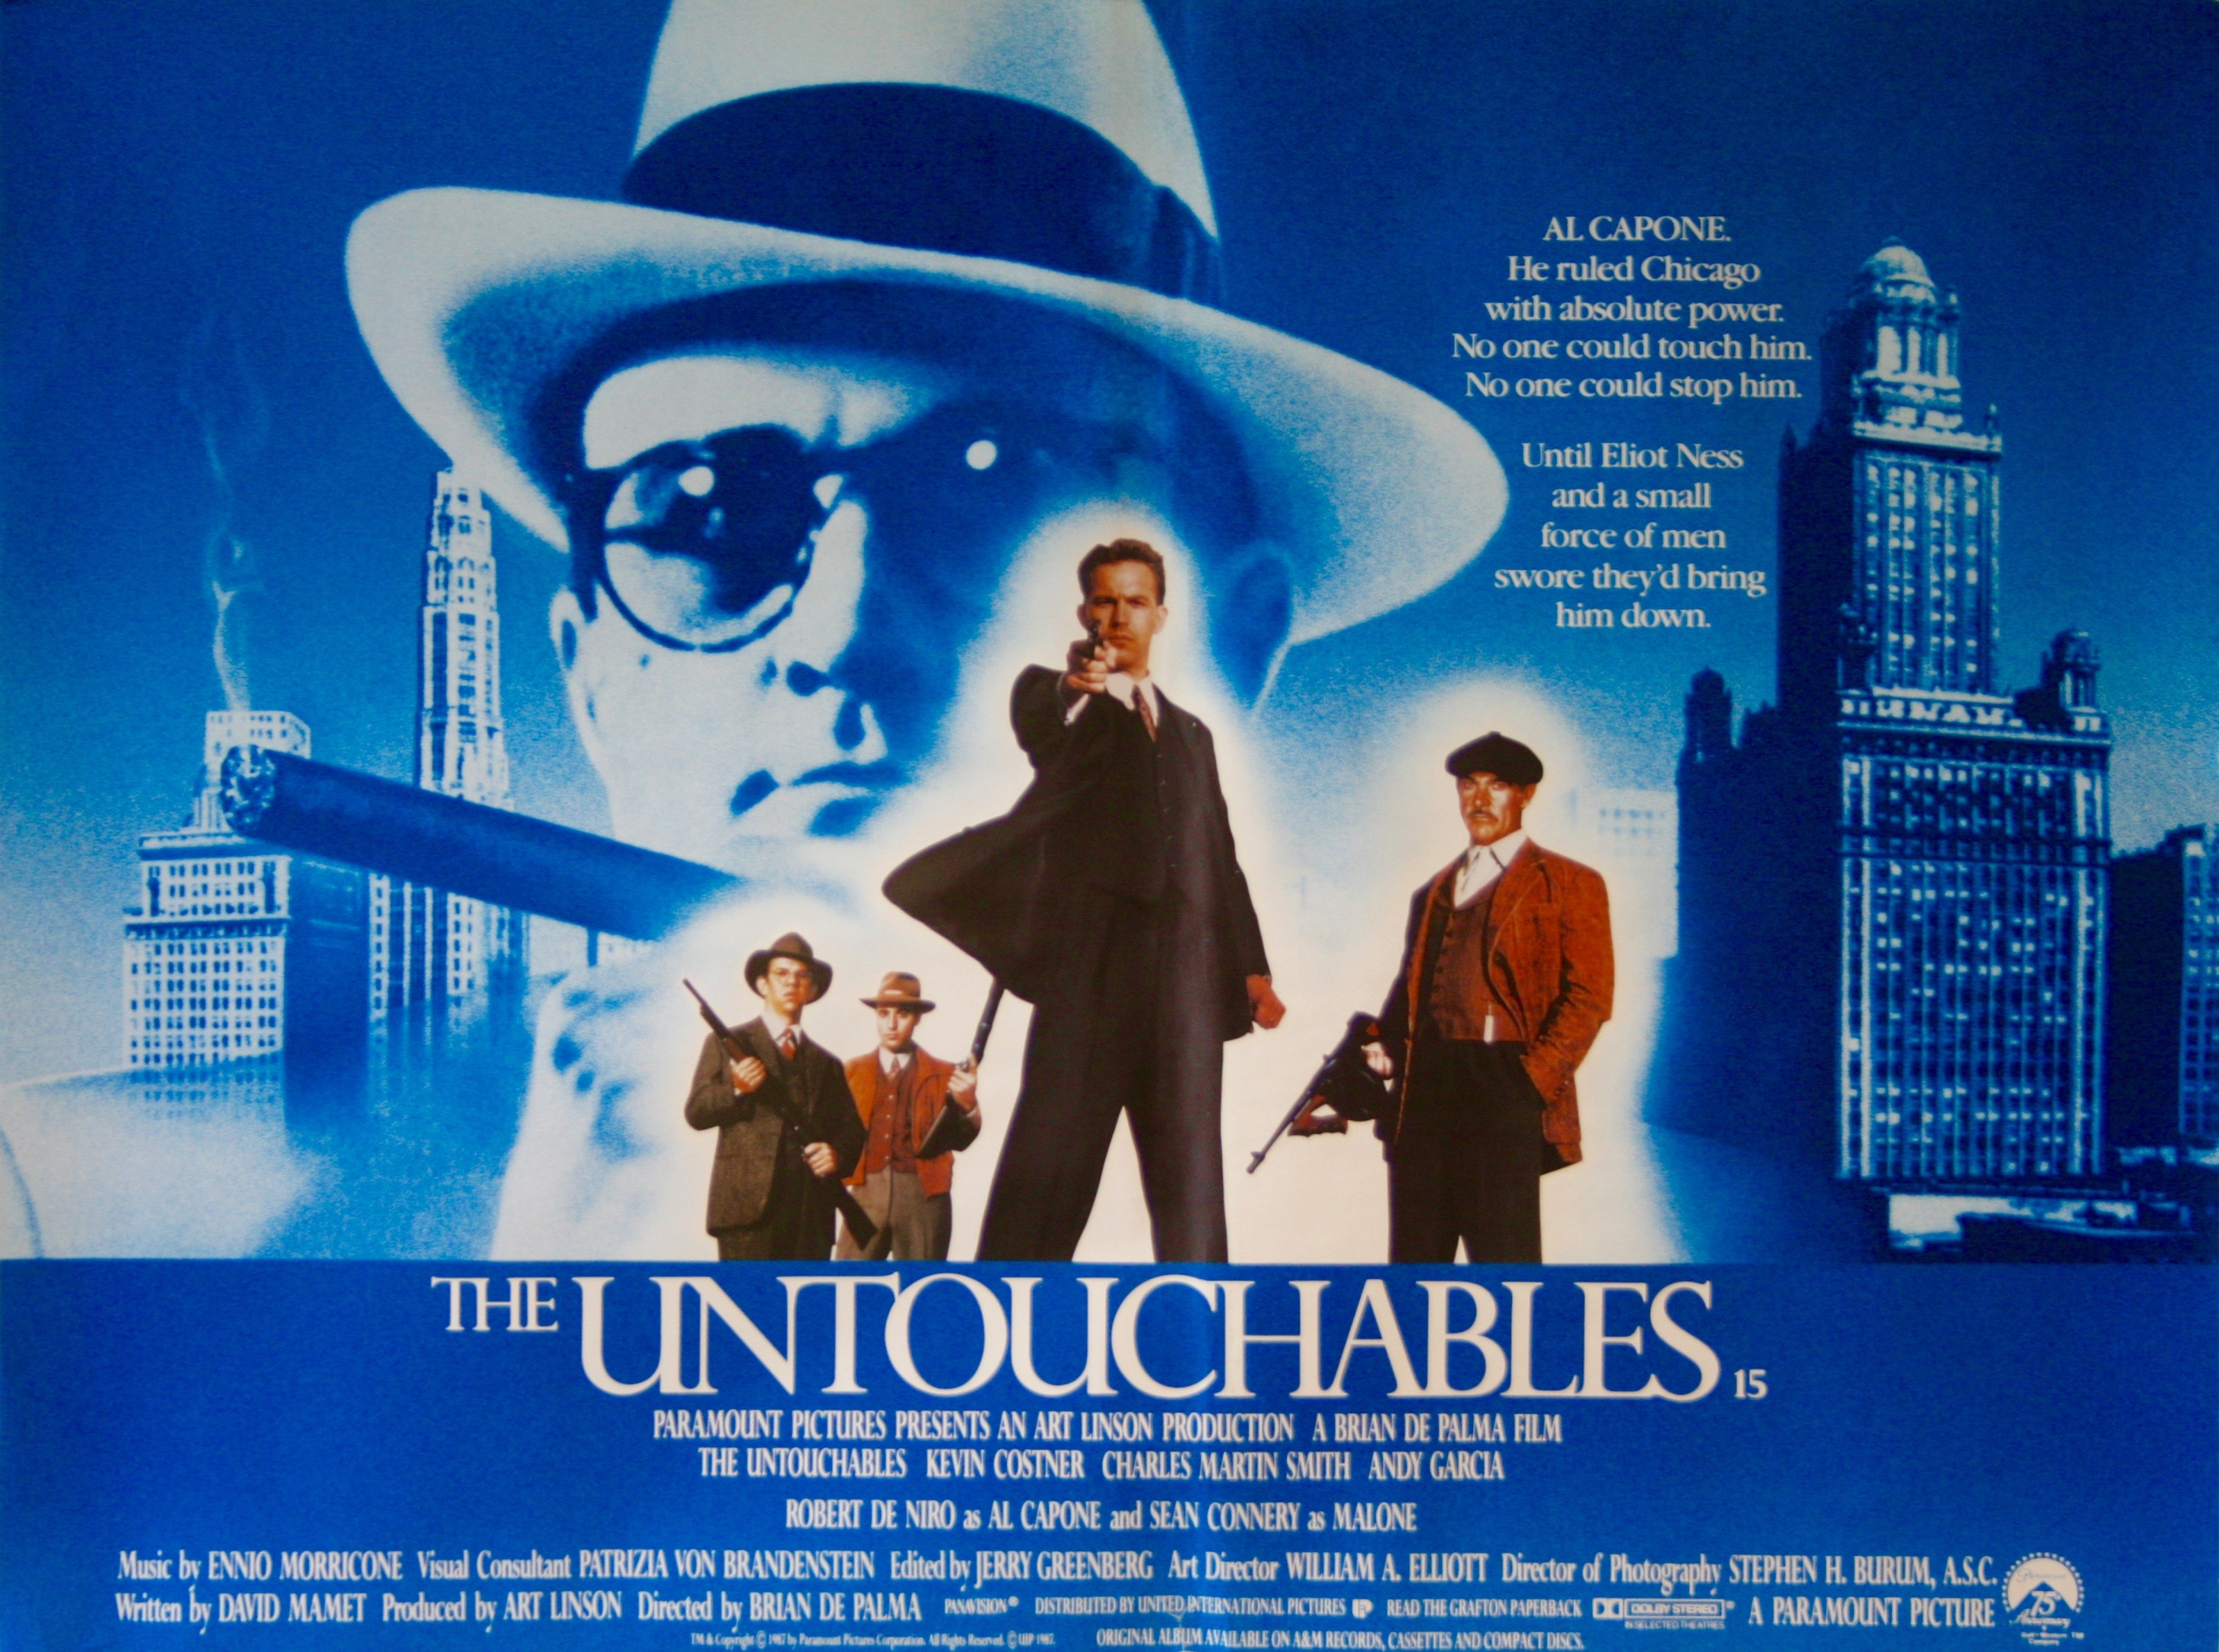 The Untouchables - Vintage Movie Posters